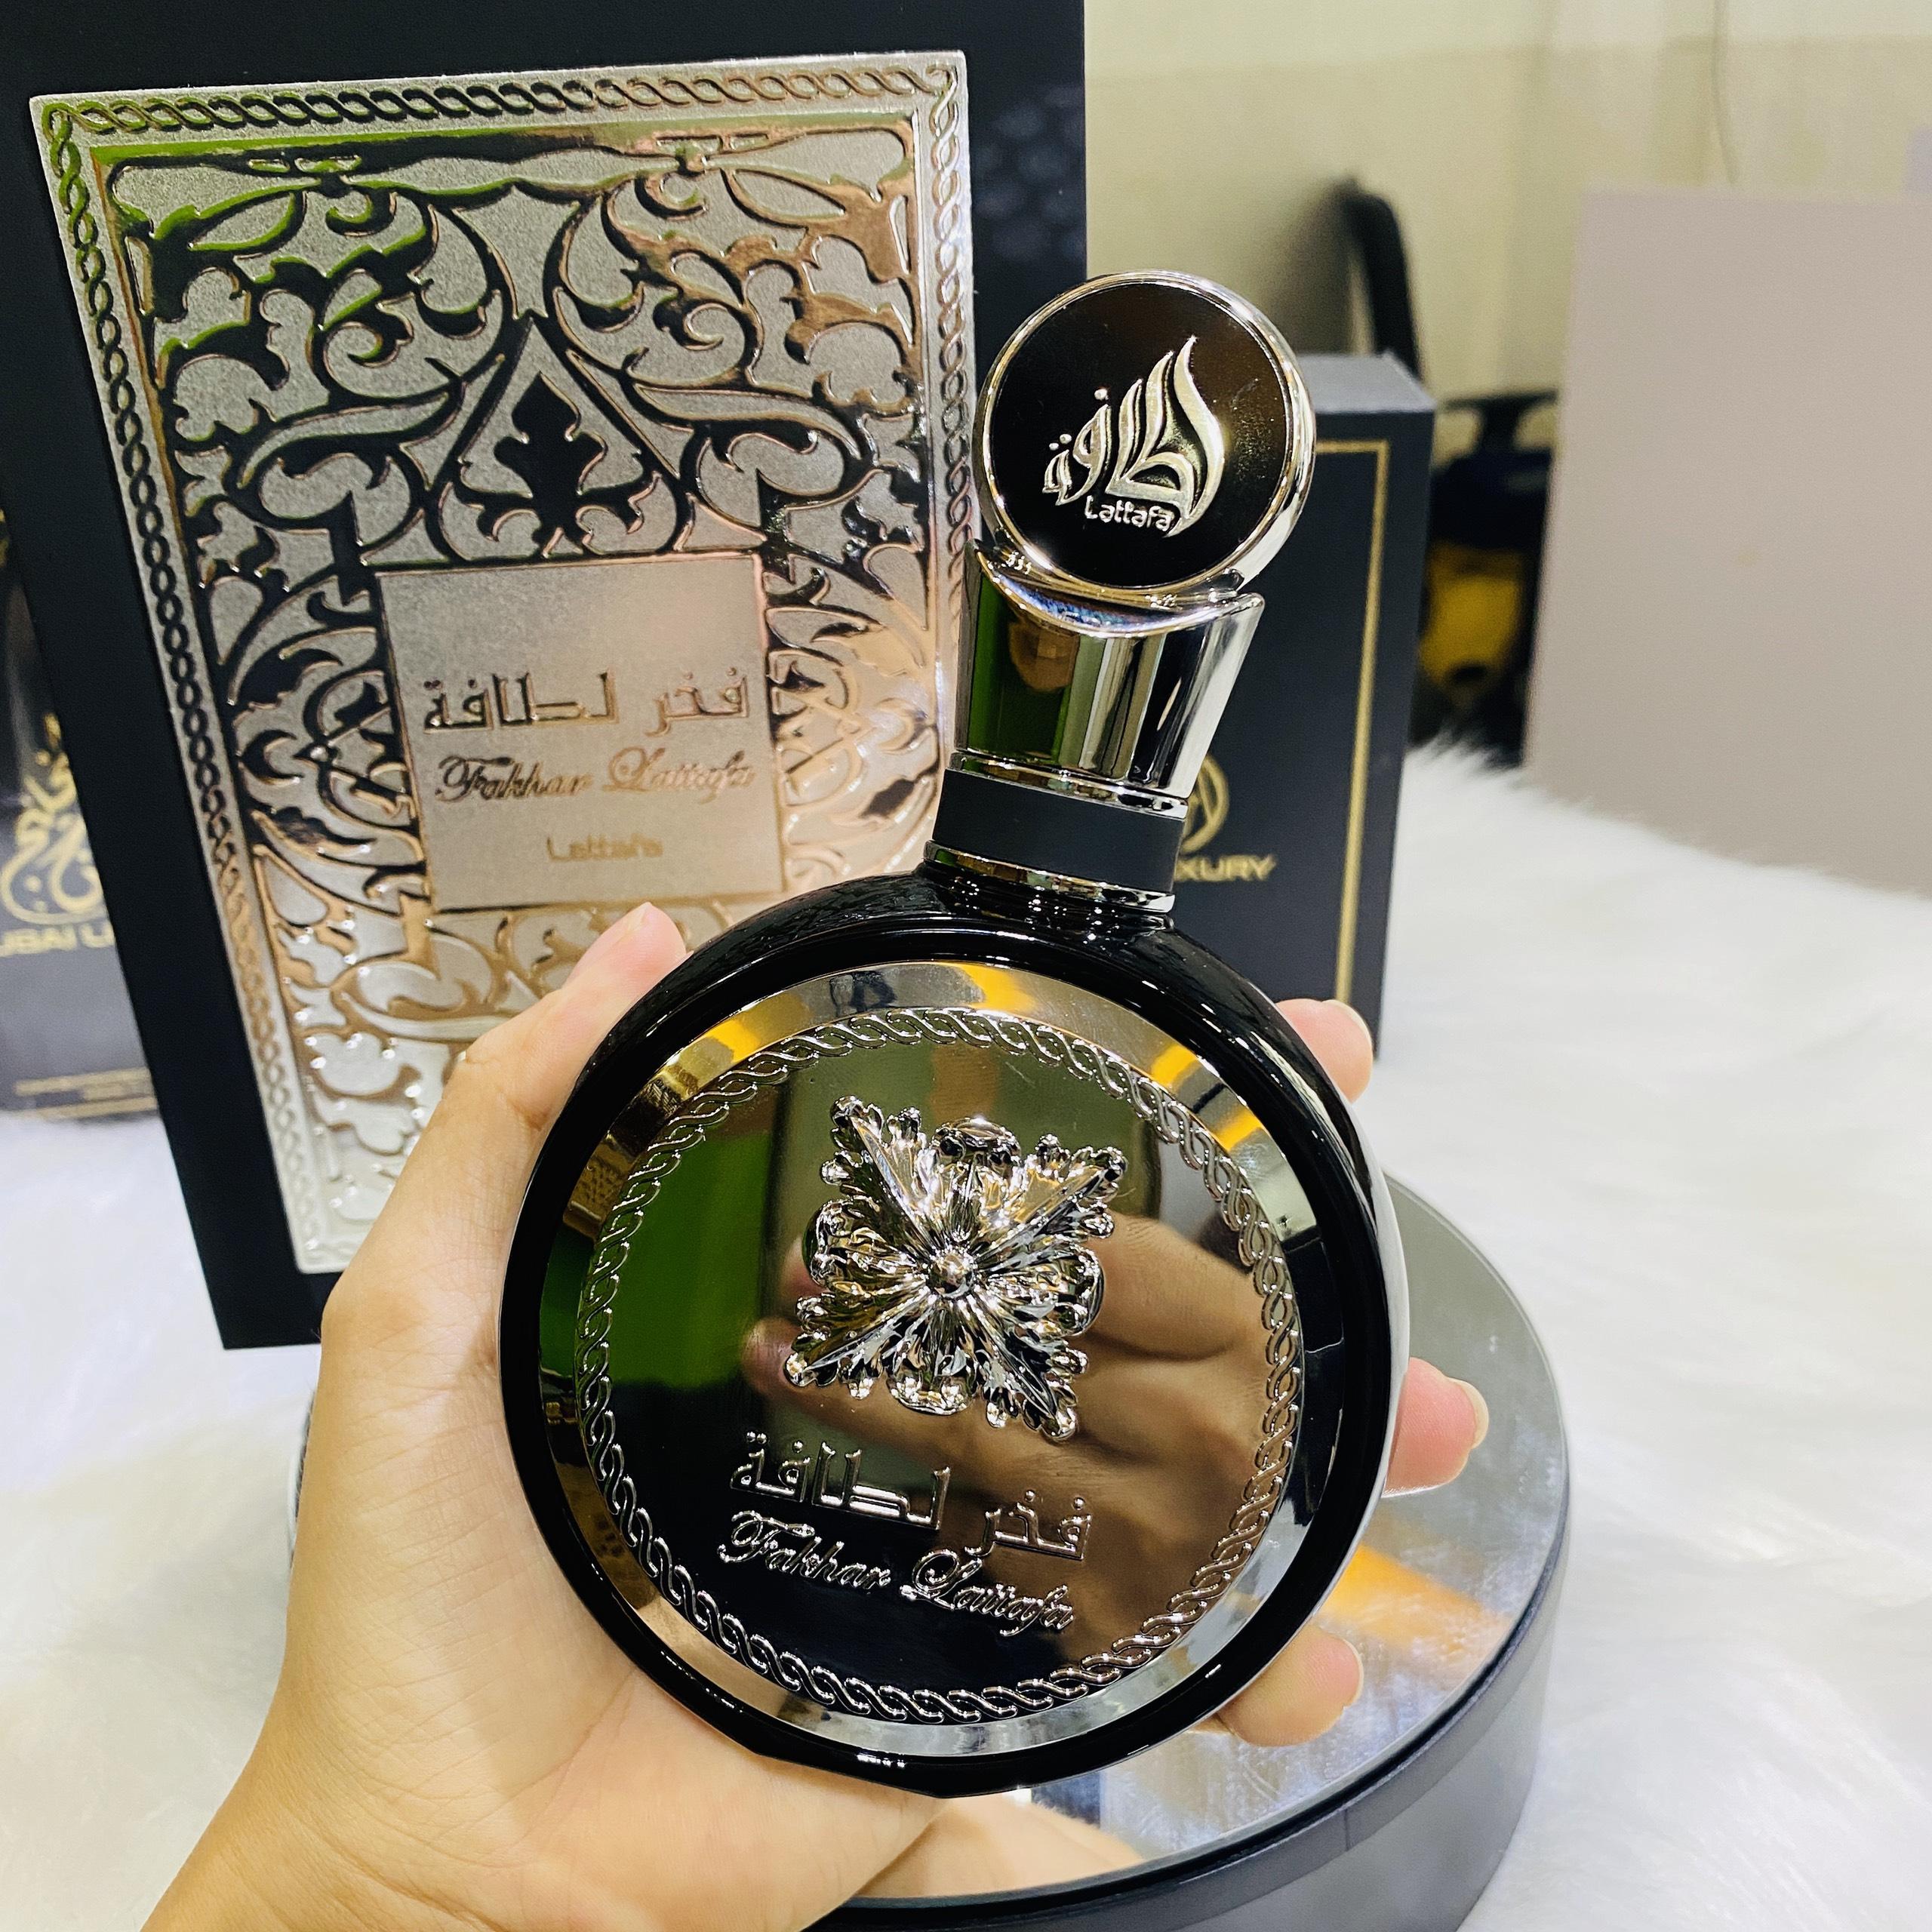 Nước hoa Dubai Fakhar Lattafa sang trong